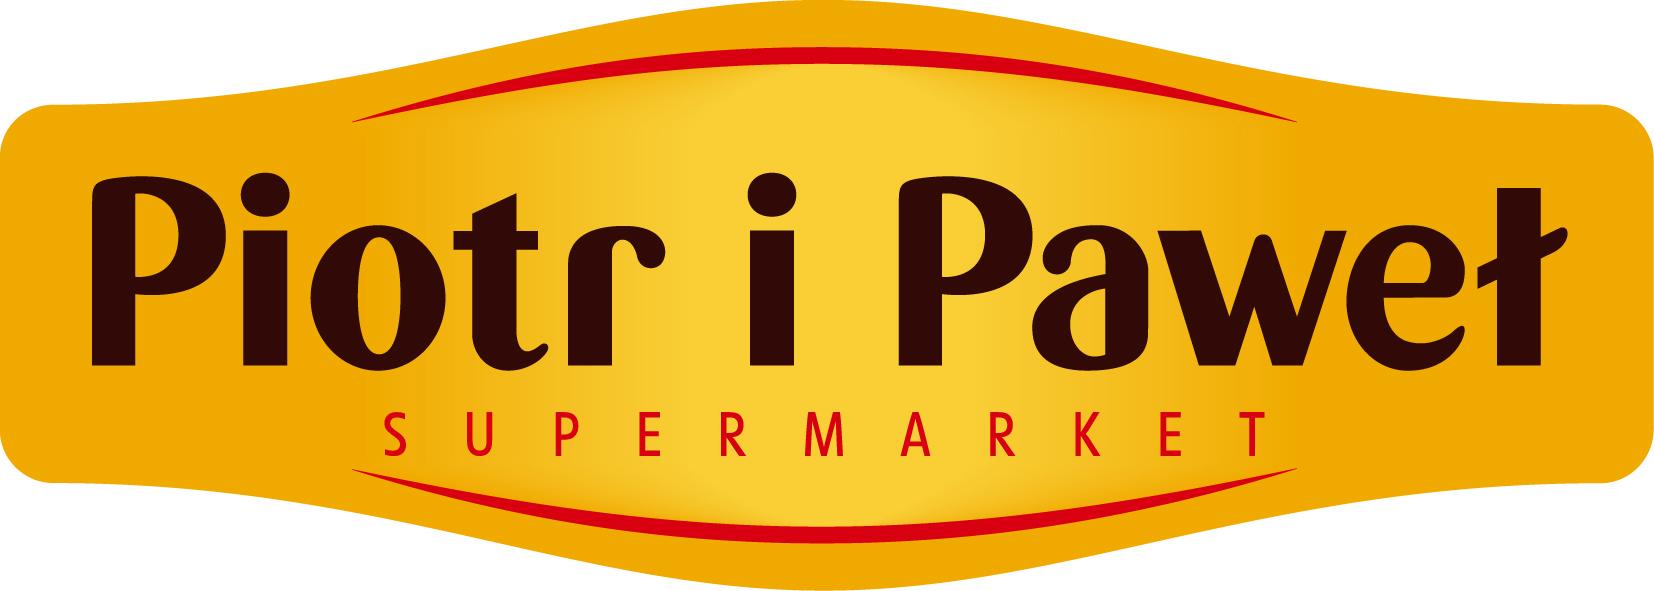 Piotr i Paweł supermarket